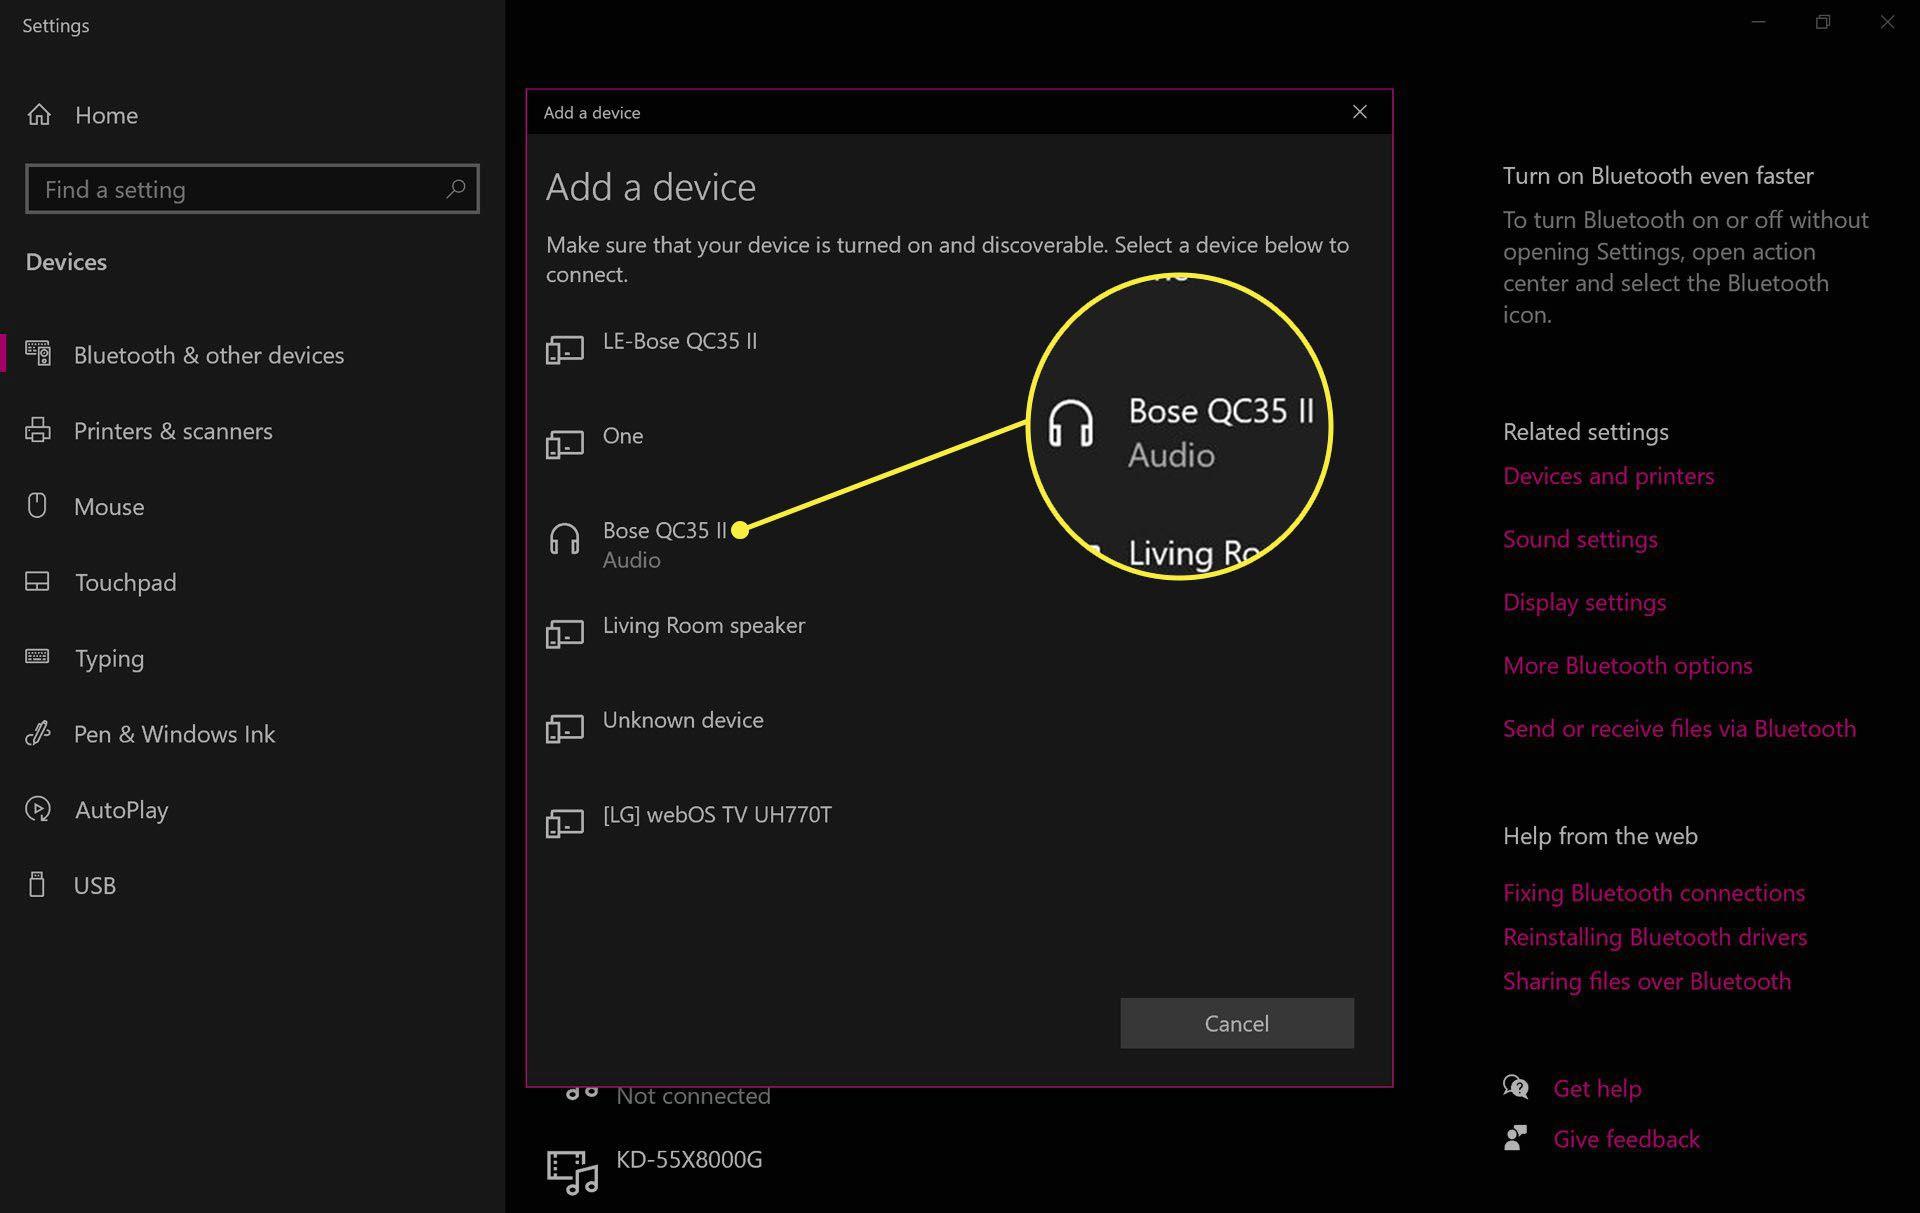 Bose headphones in Windows 10 Bluetooth settings.